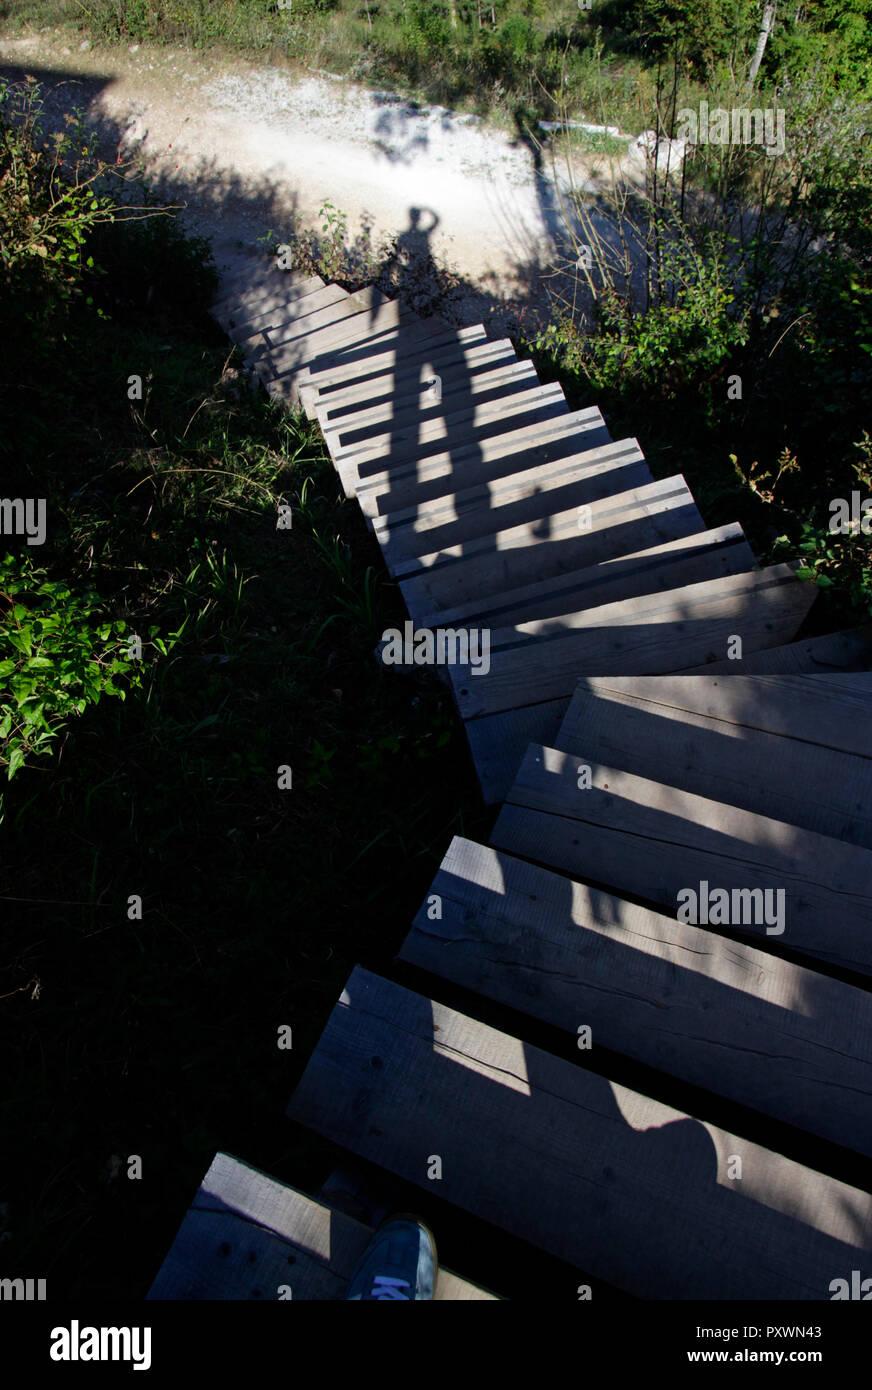 Shadow selfie on stairs - Stock Image